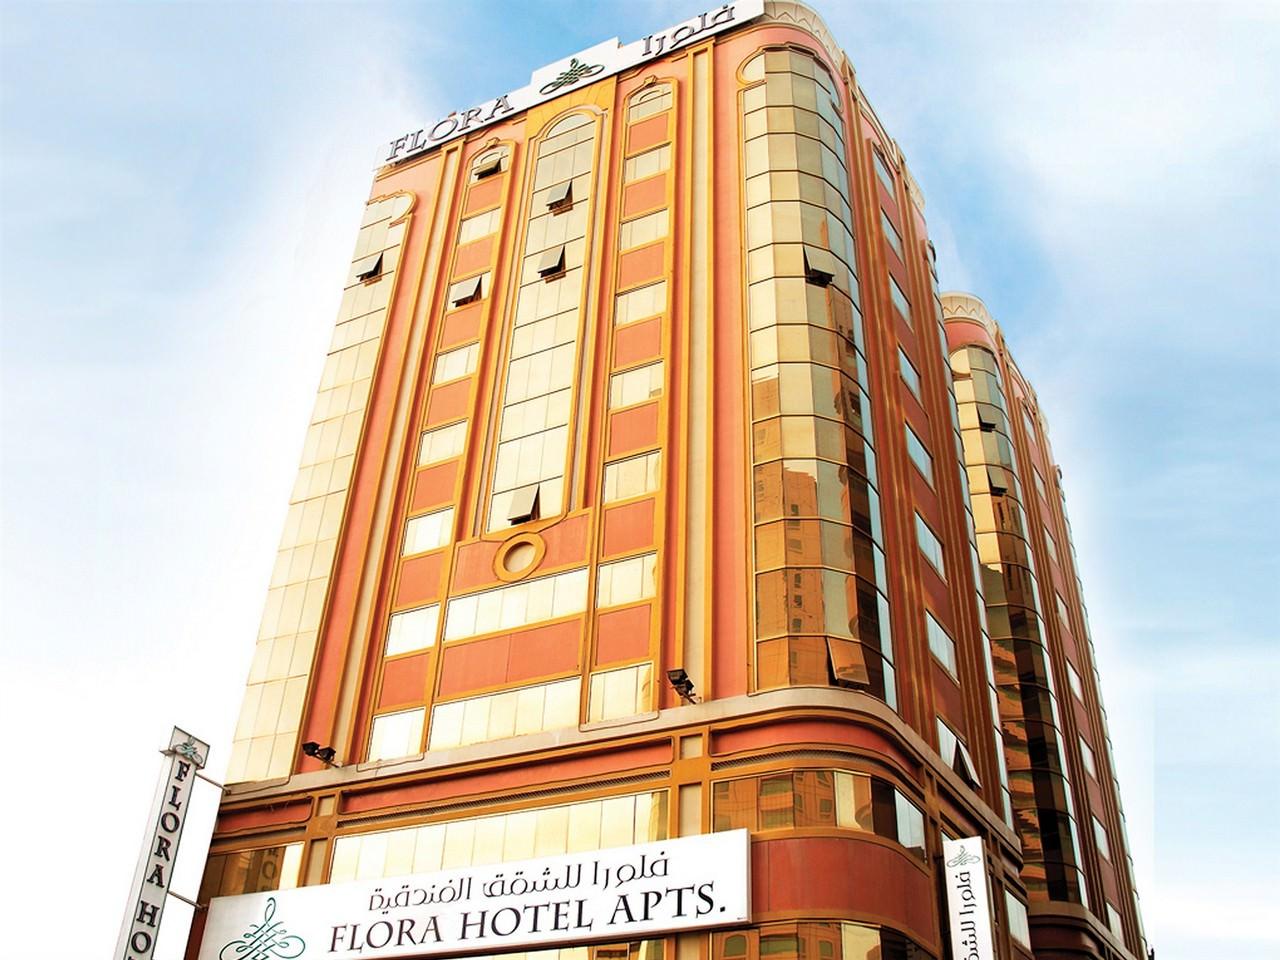 flora-hotel-apartments